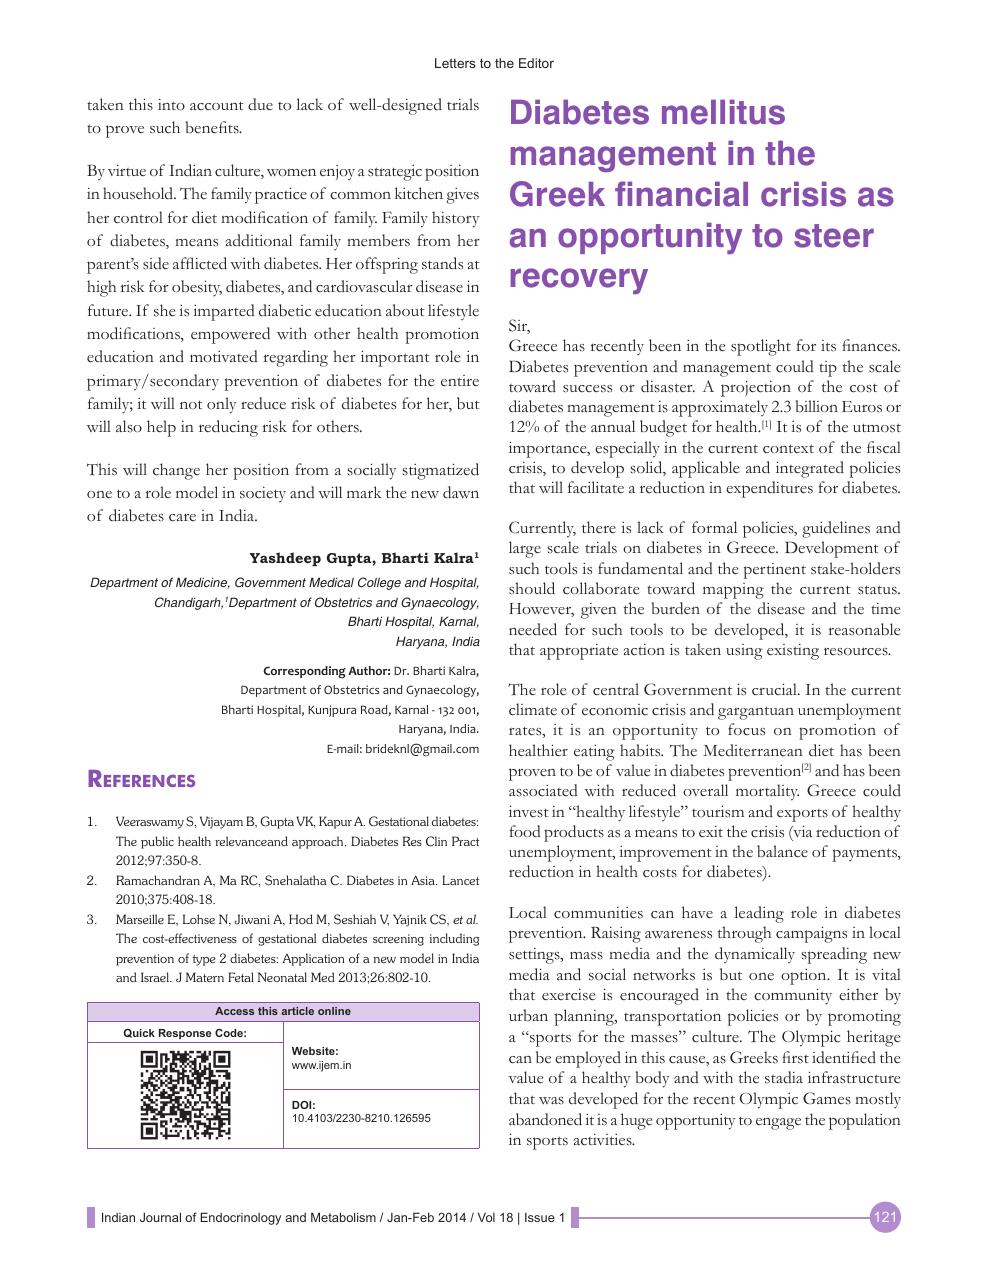 Diabetes mellitus management in the Greek financial crisis